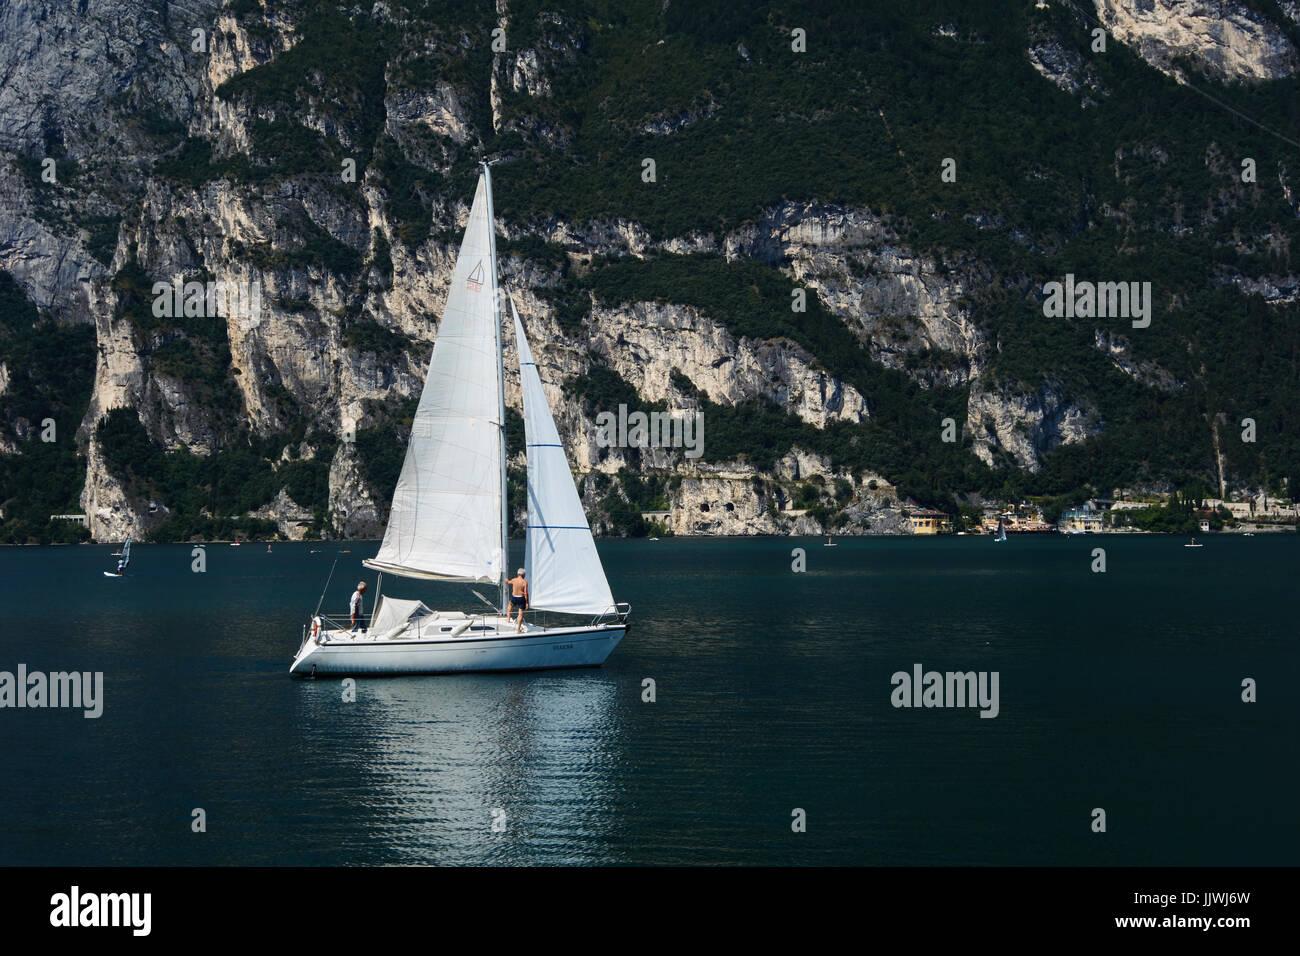 Private yacht on lake Garda. Italy - Stock Image